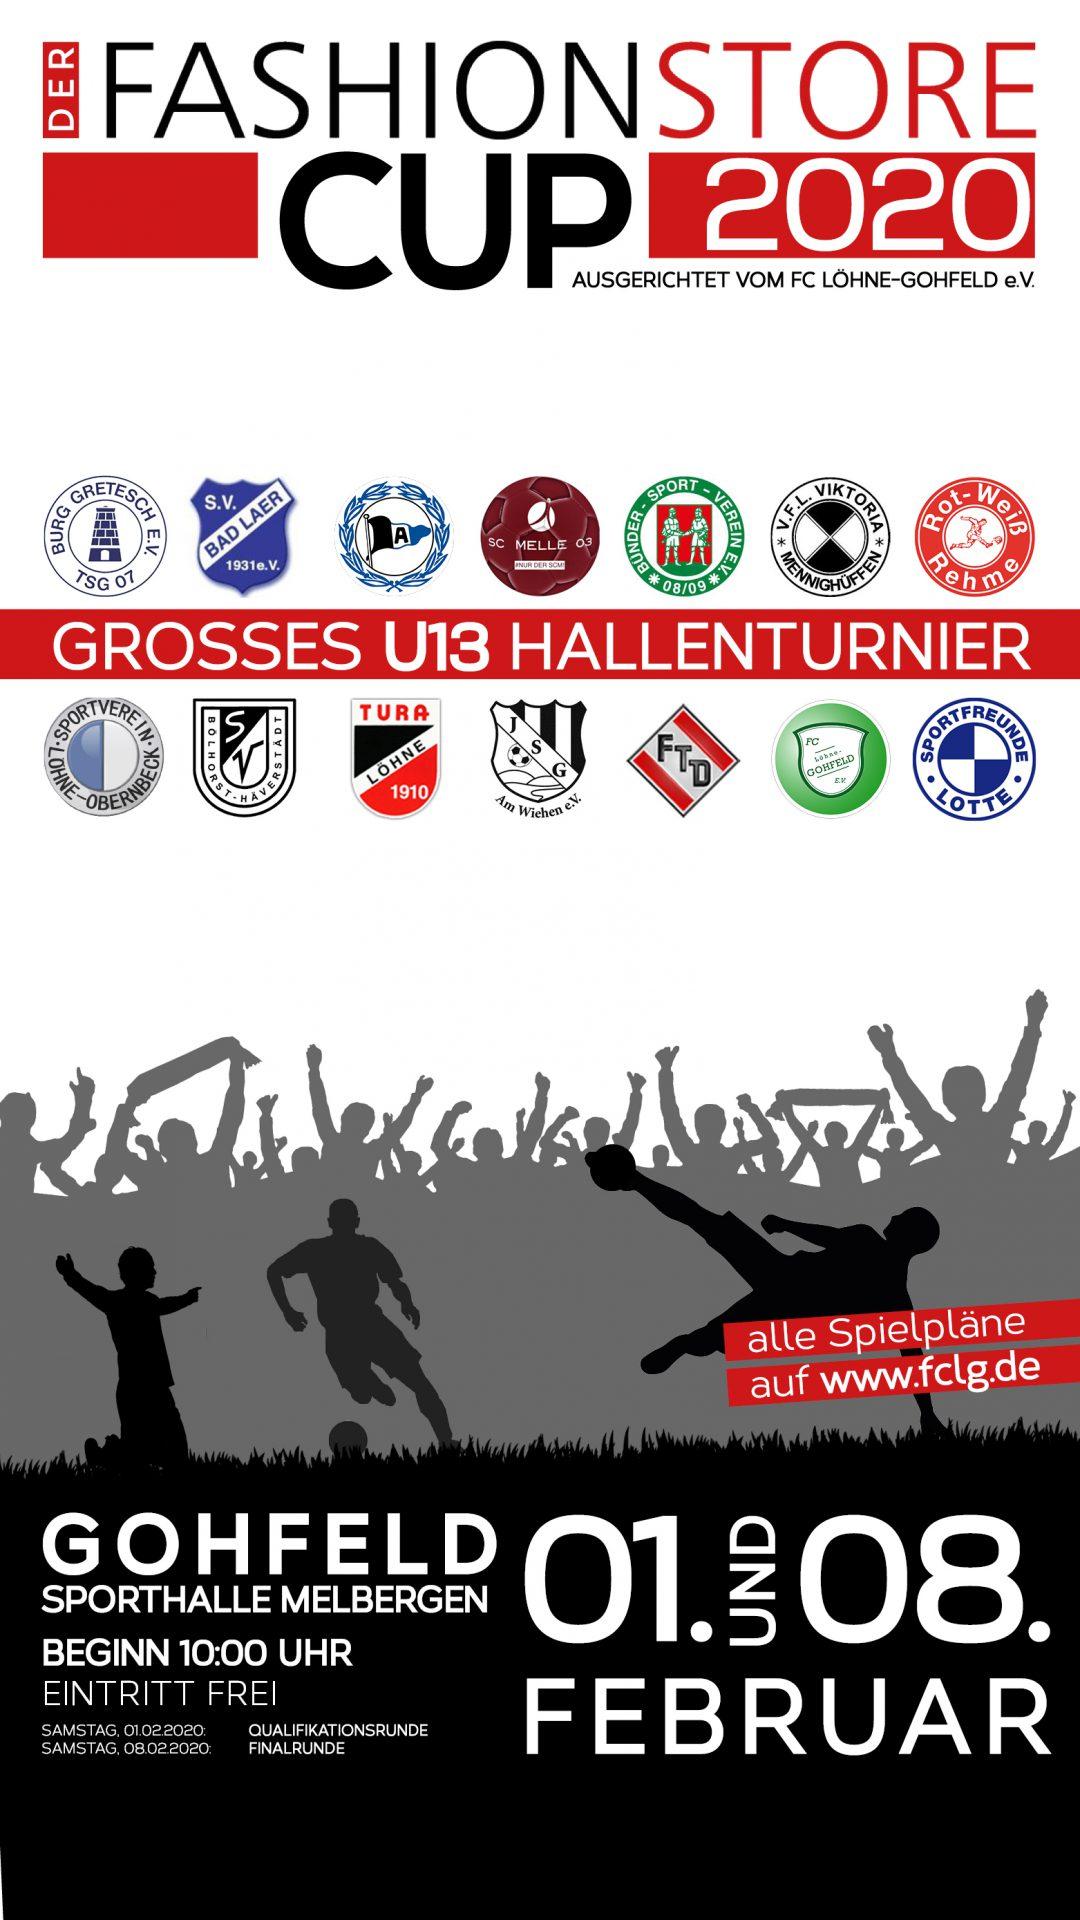 Gohfelder FashionStore Cup 2020